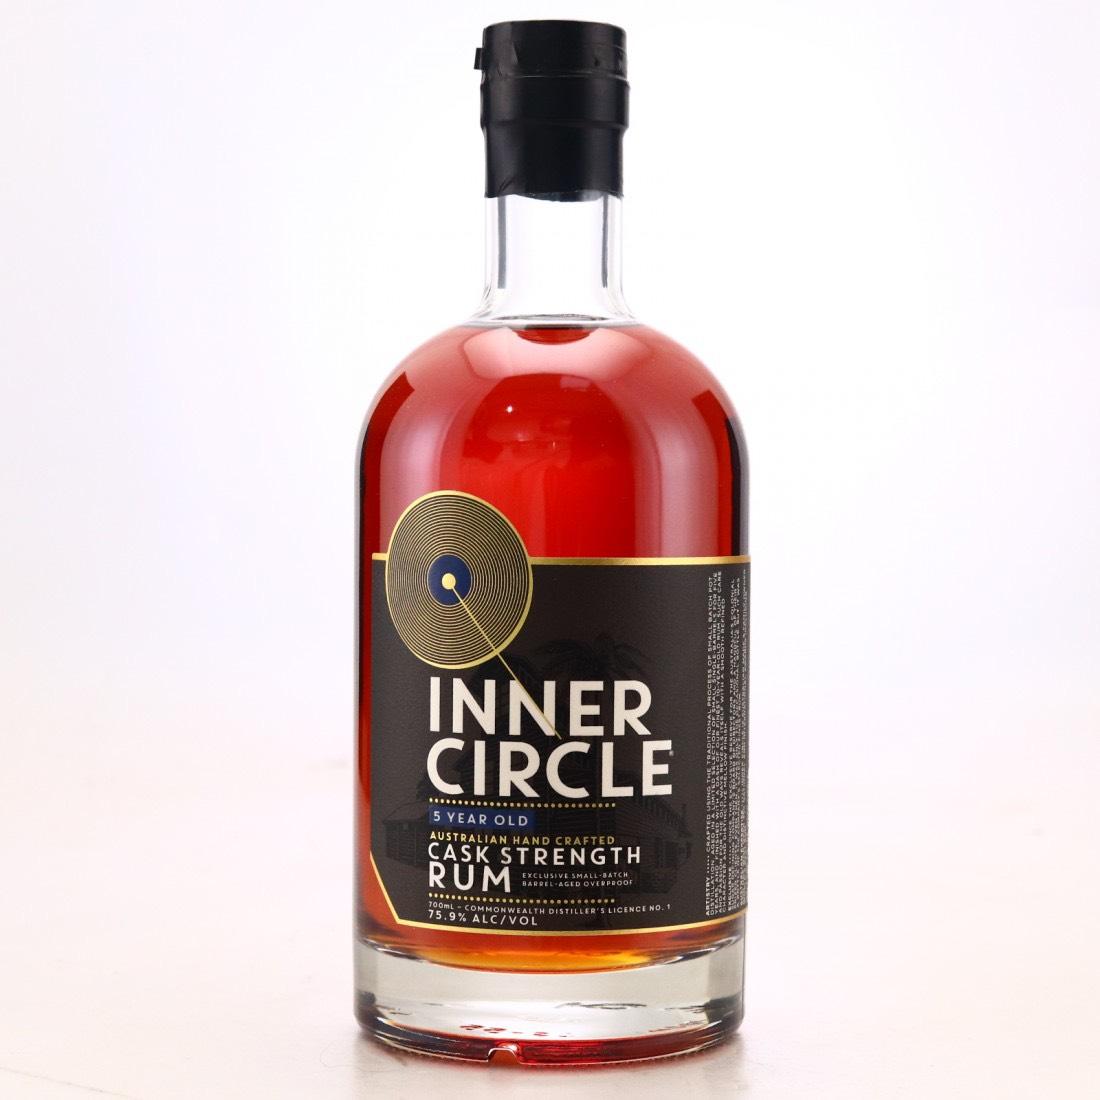 Bottle image of Cask Strength Rum